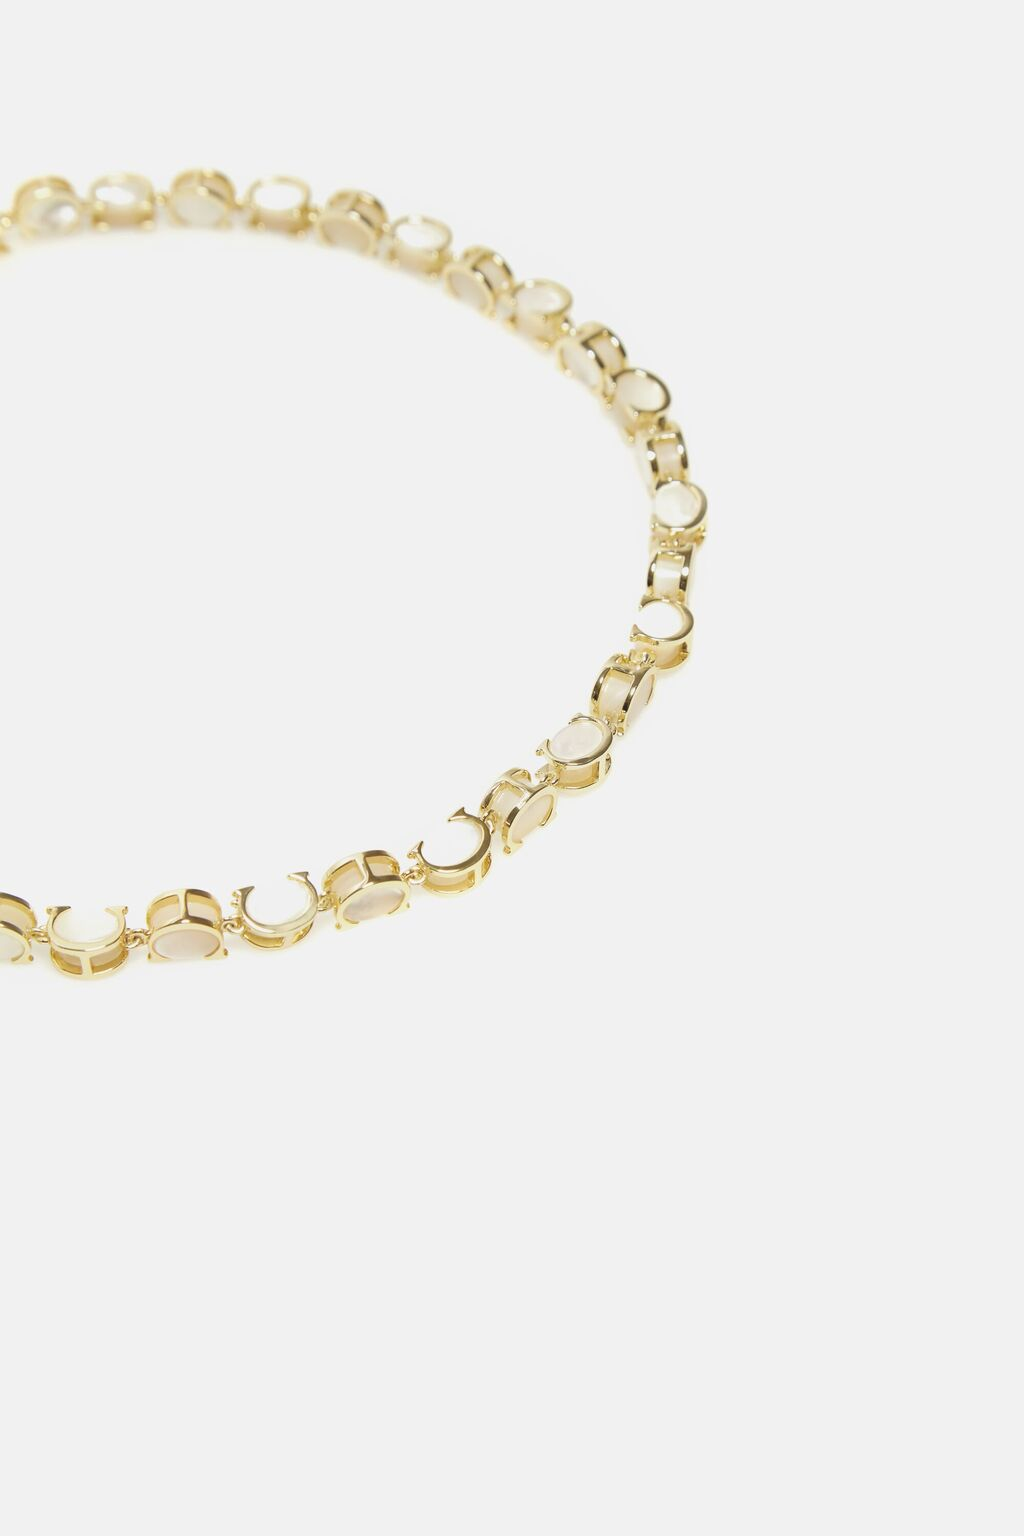 Scala necklace